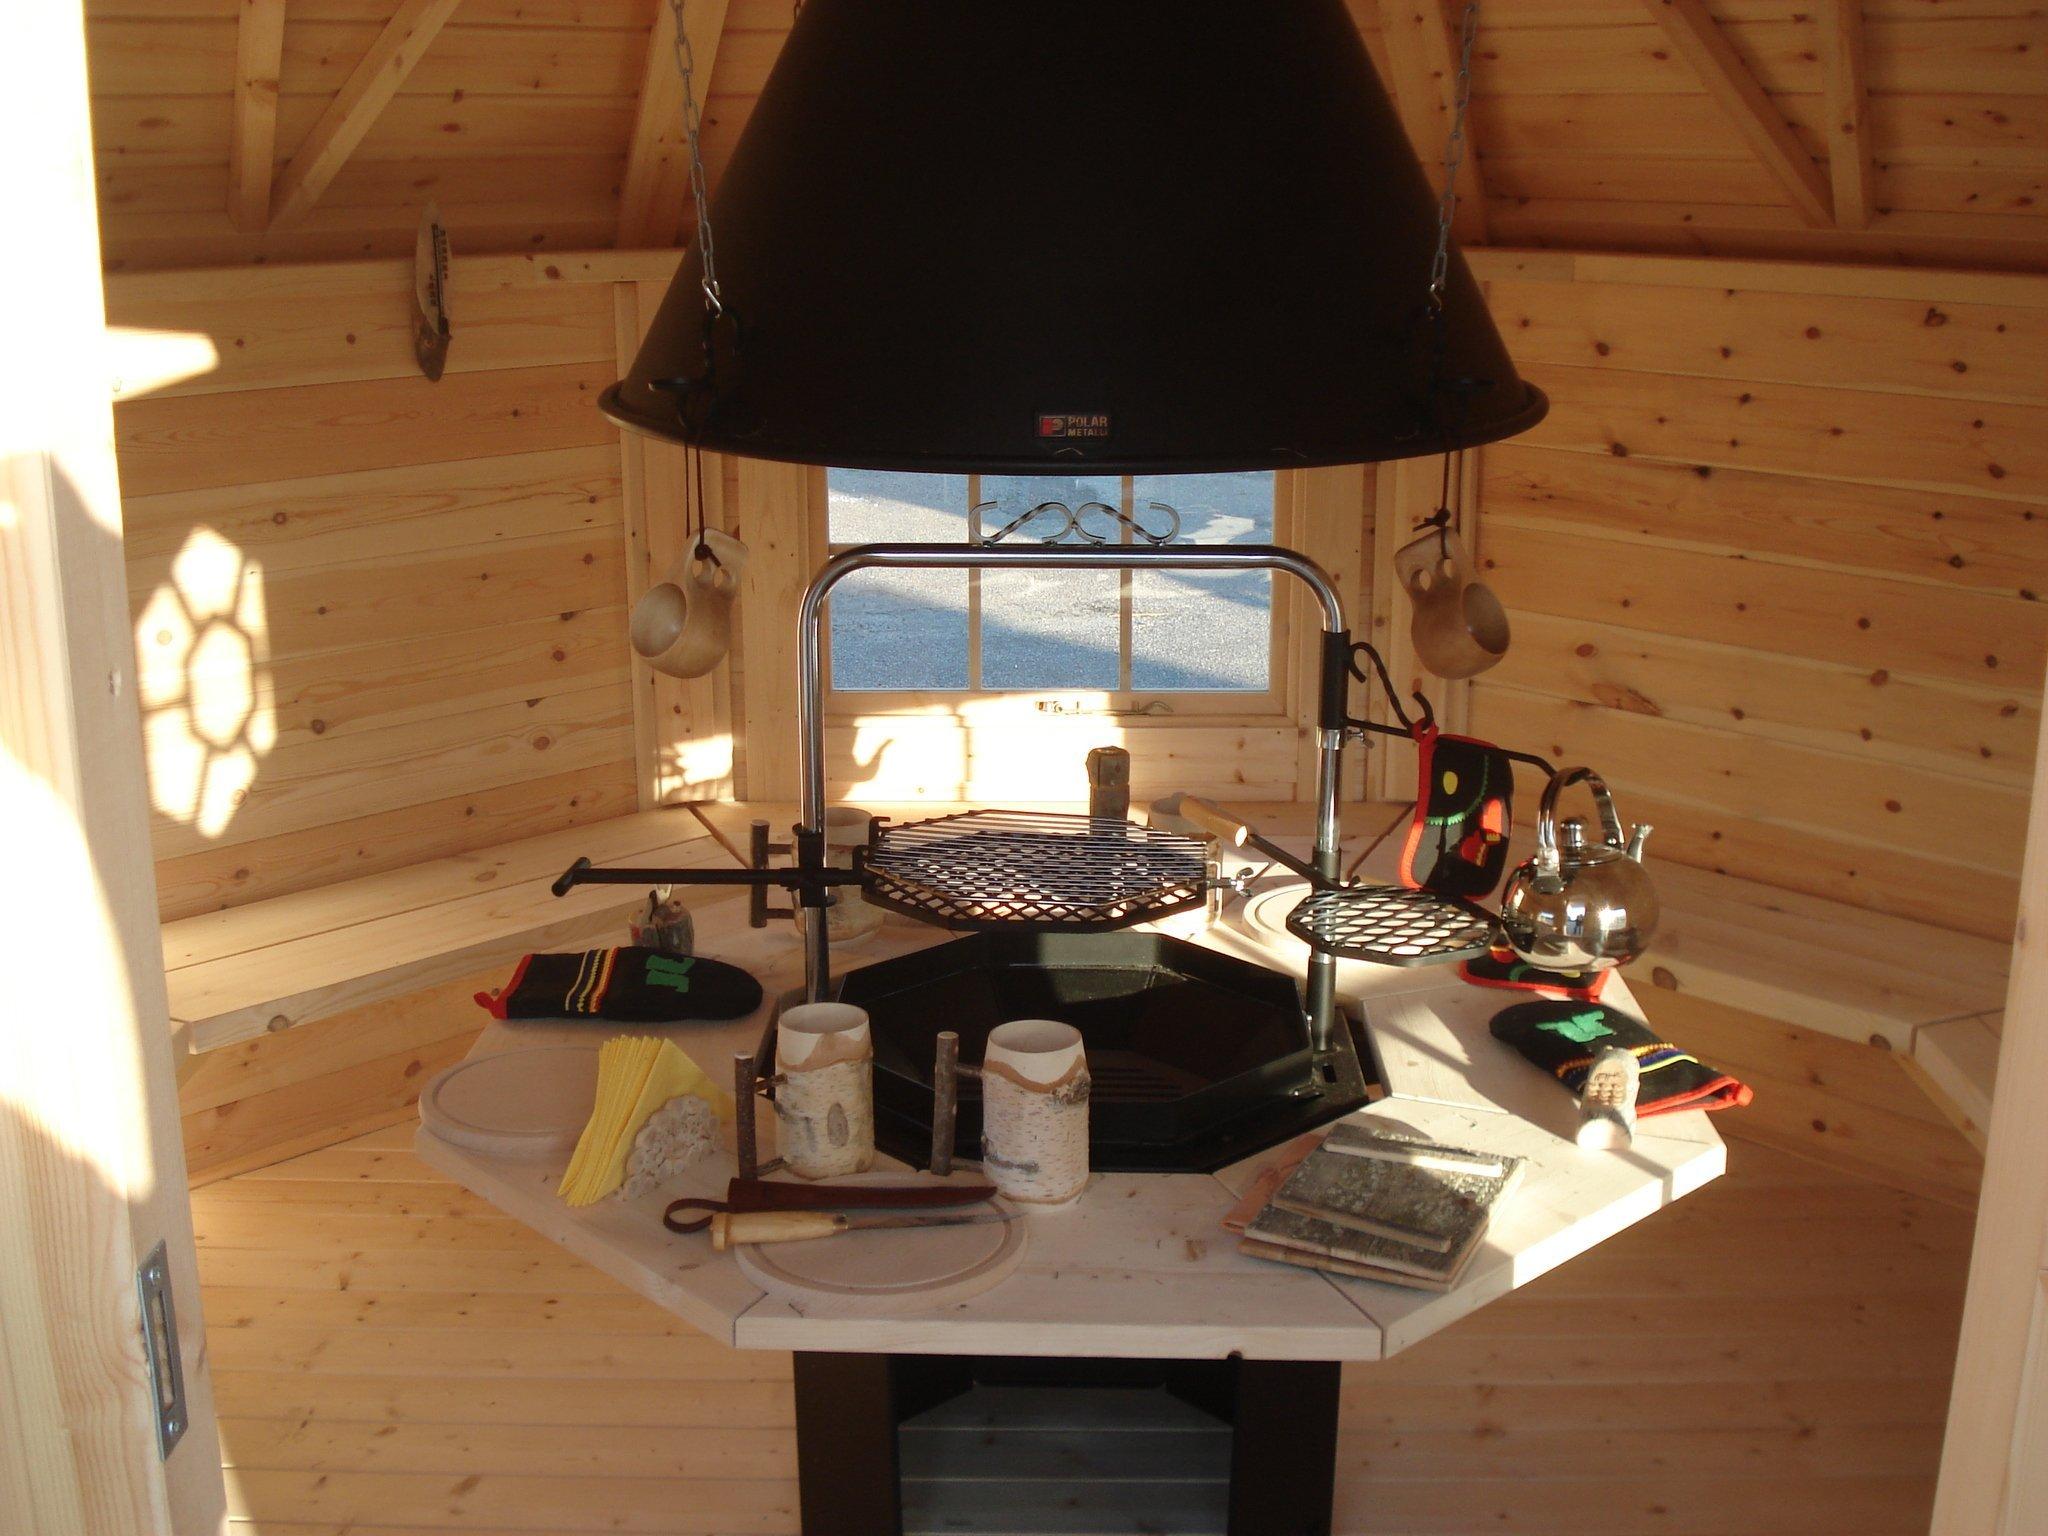 grillhütte / kota 8,0 m² - scandinavic wood art